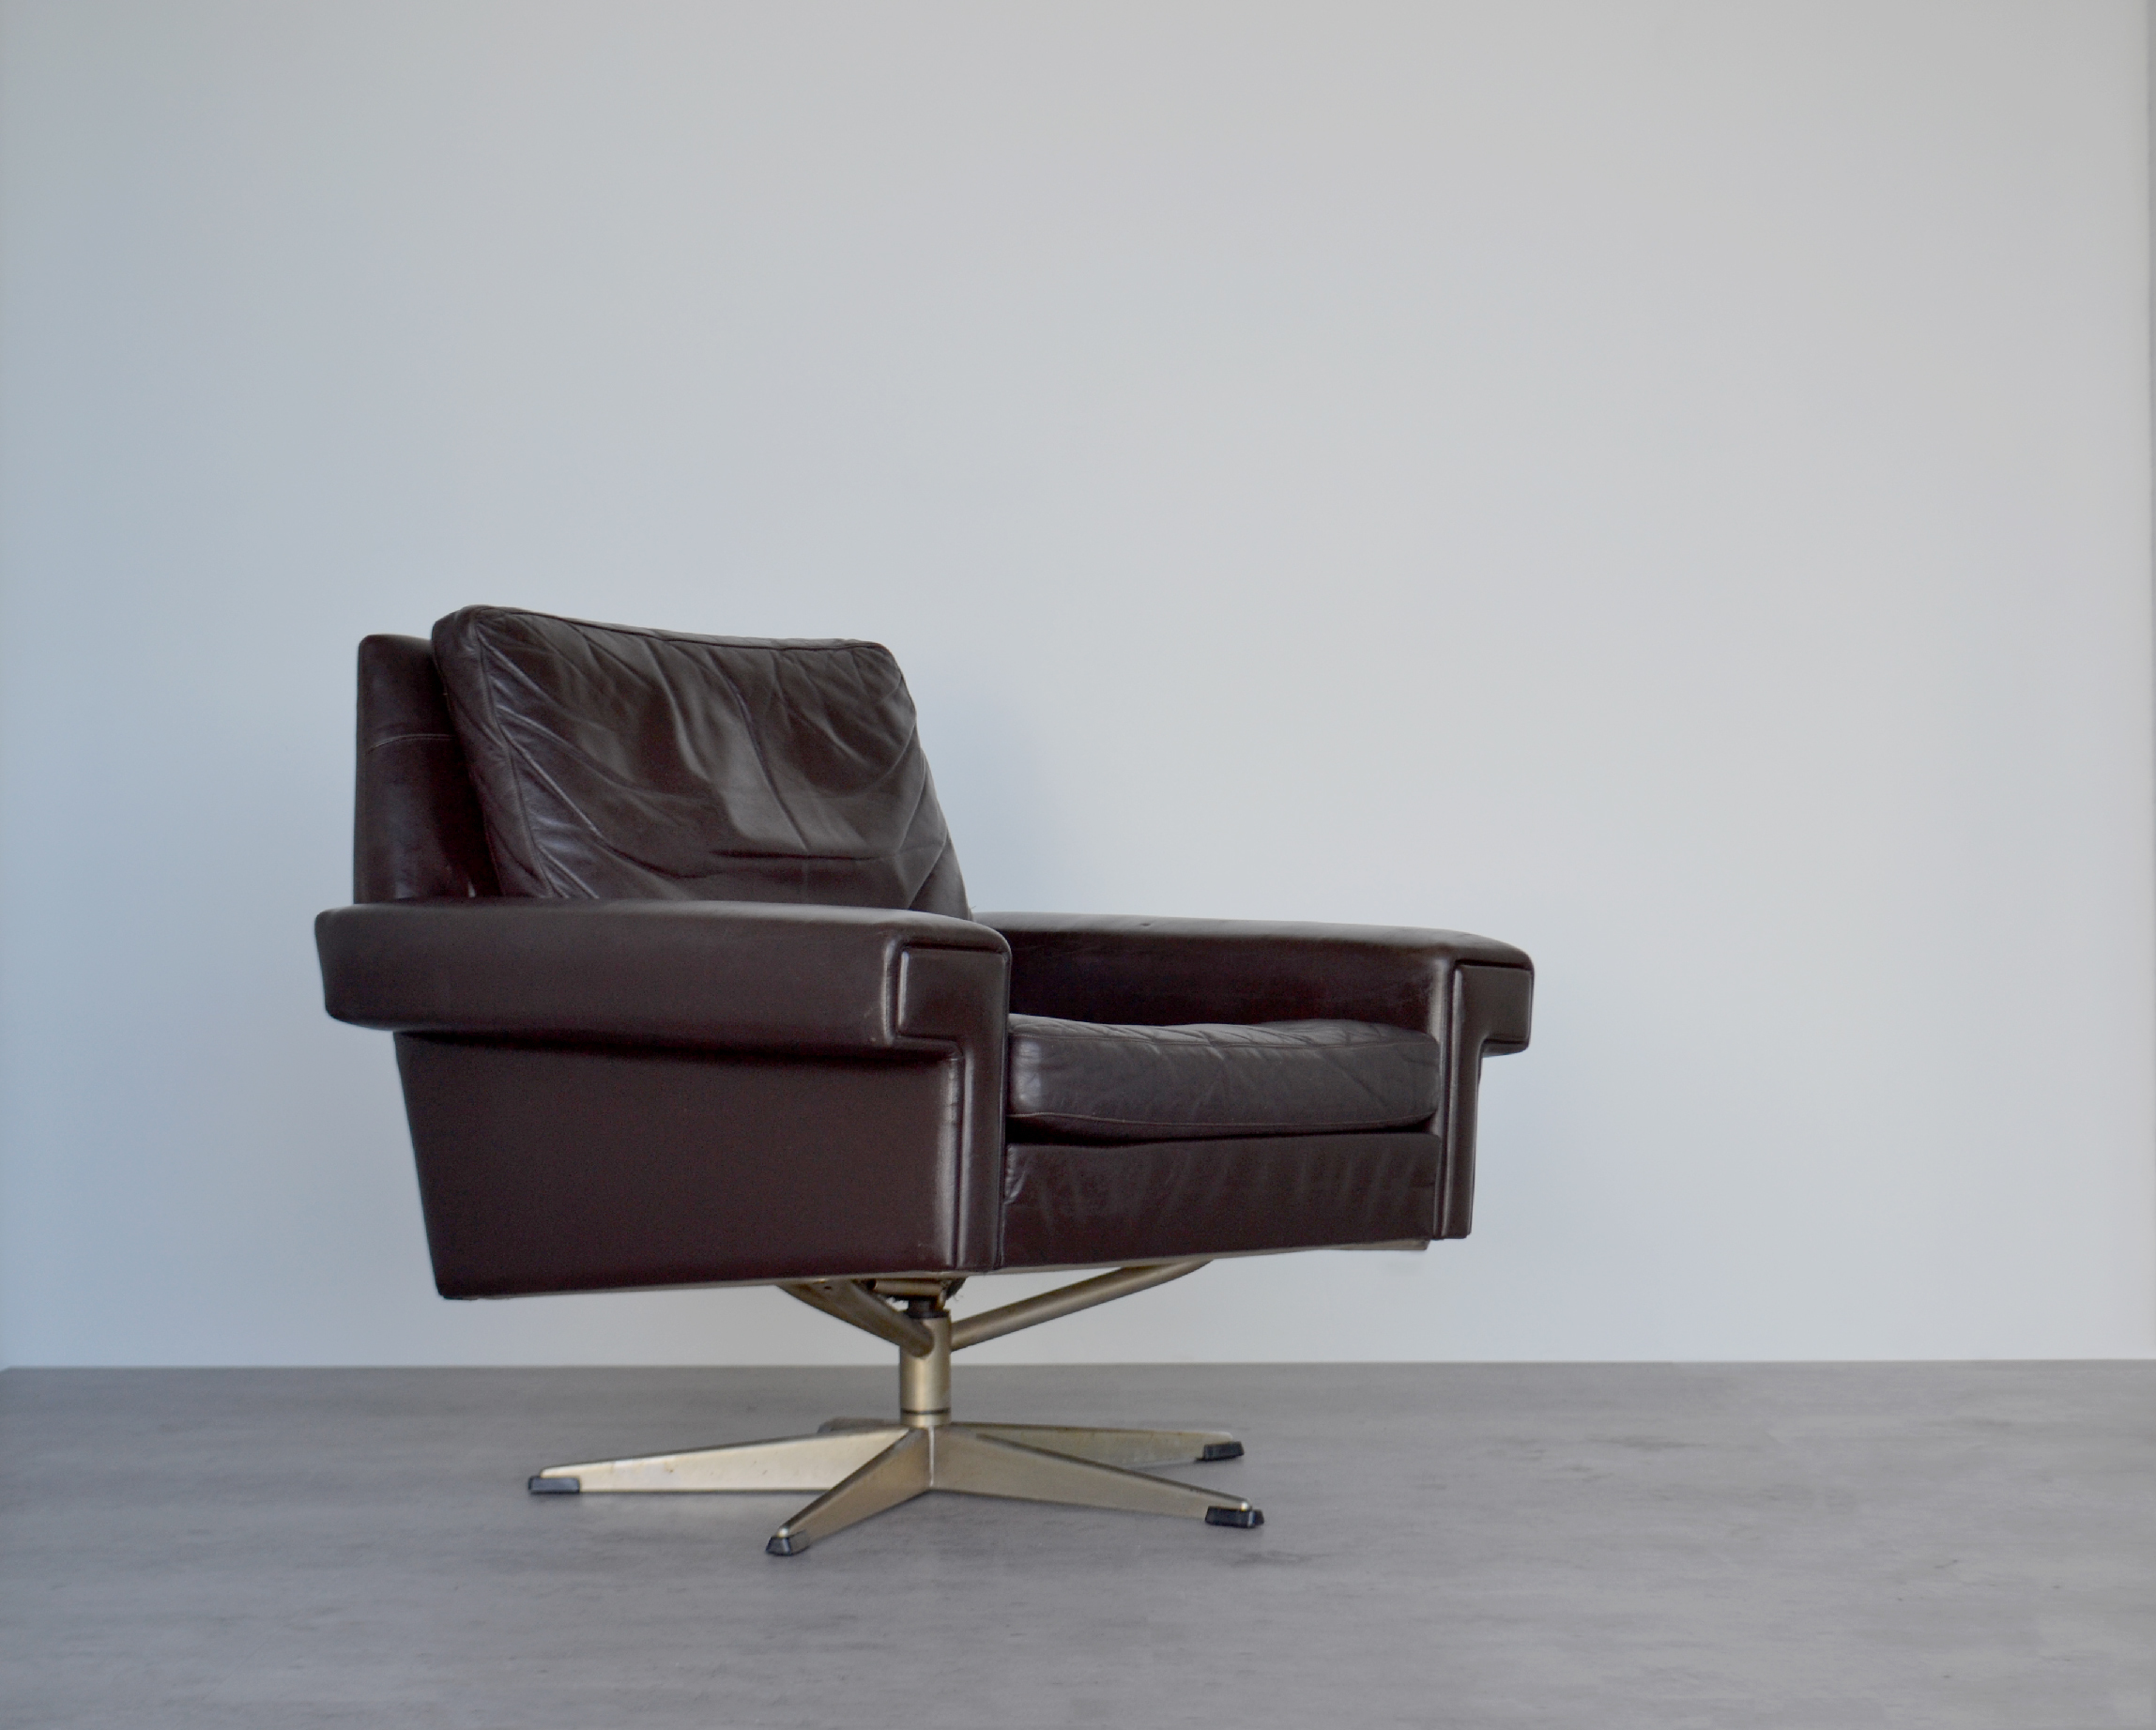 Original Vintage Mid Century Danish Modernist Dark Brown Leather Chrome Swivel Chair Armchair Lounge Desk By Georg Thams